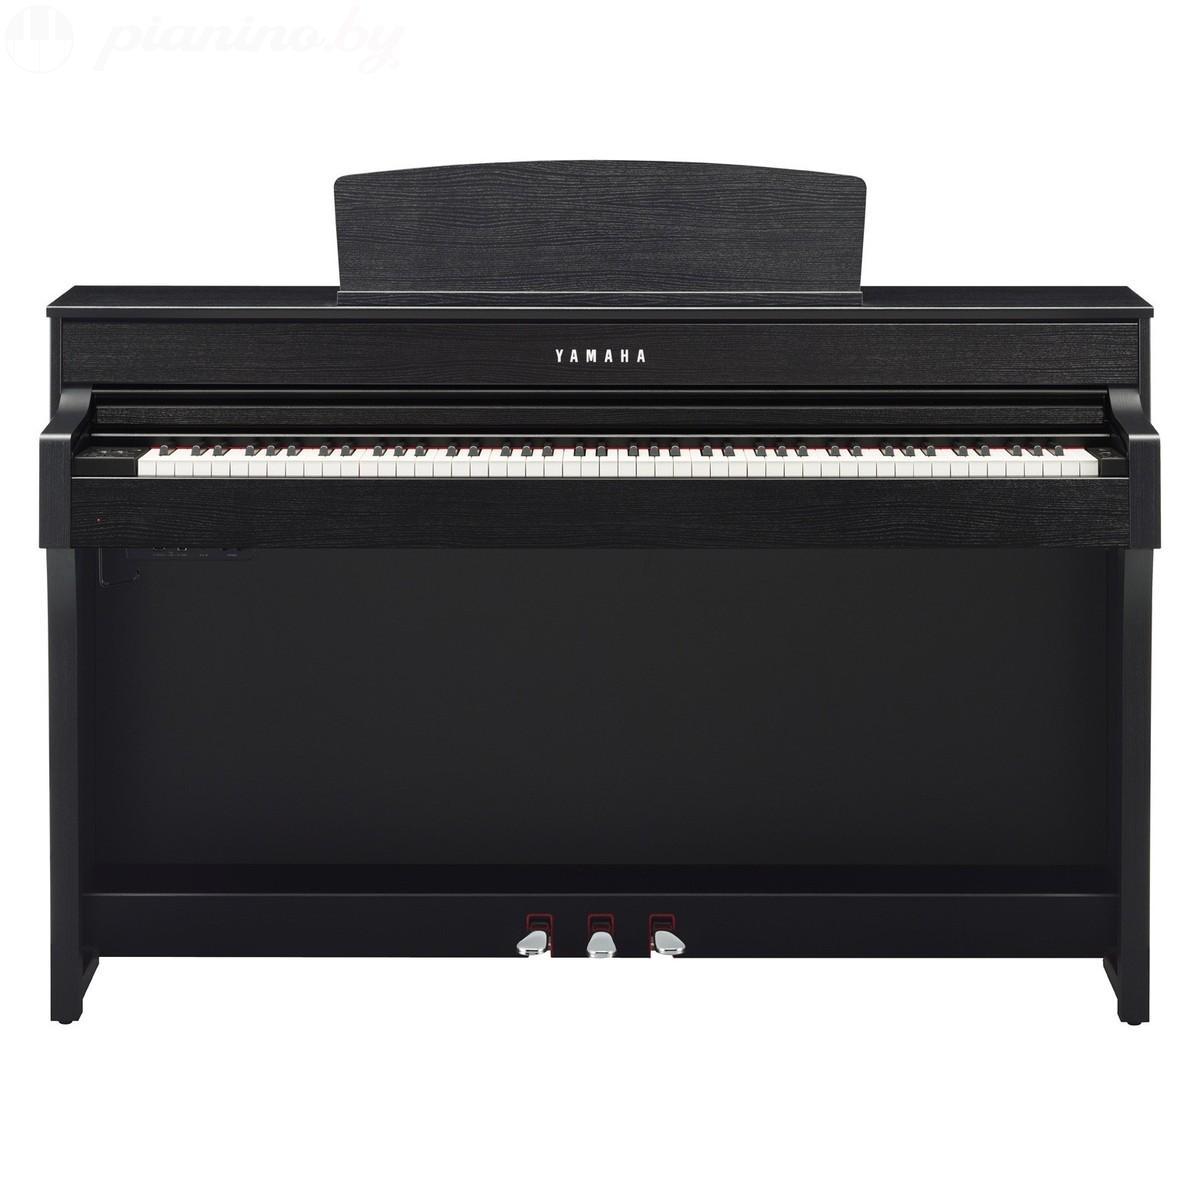 Цифровое пианино Yamaha Clavinova CLP-545B Black Walnut Фото 3